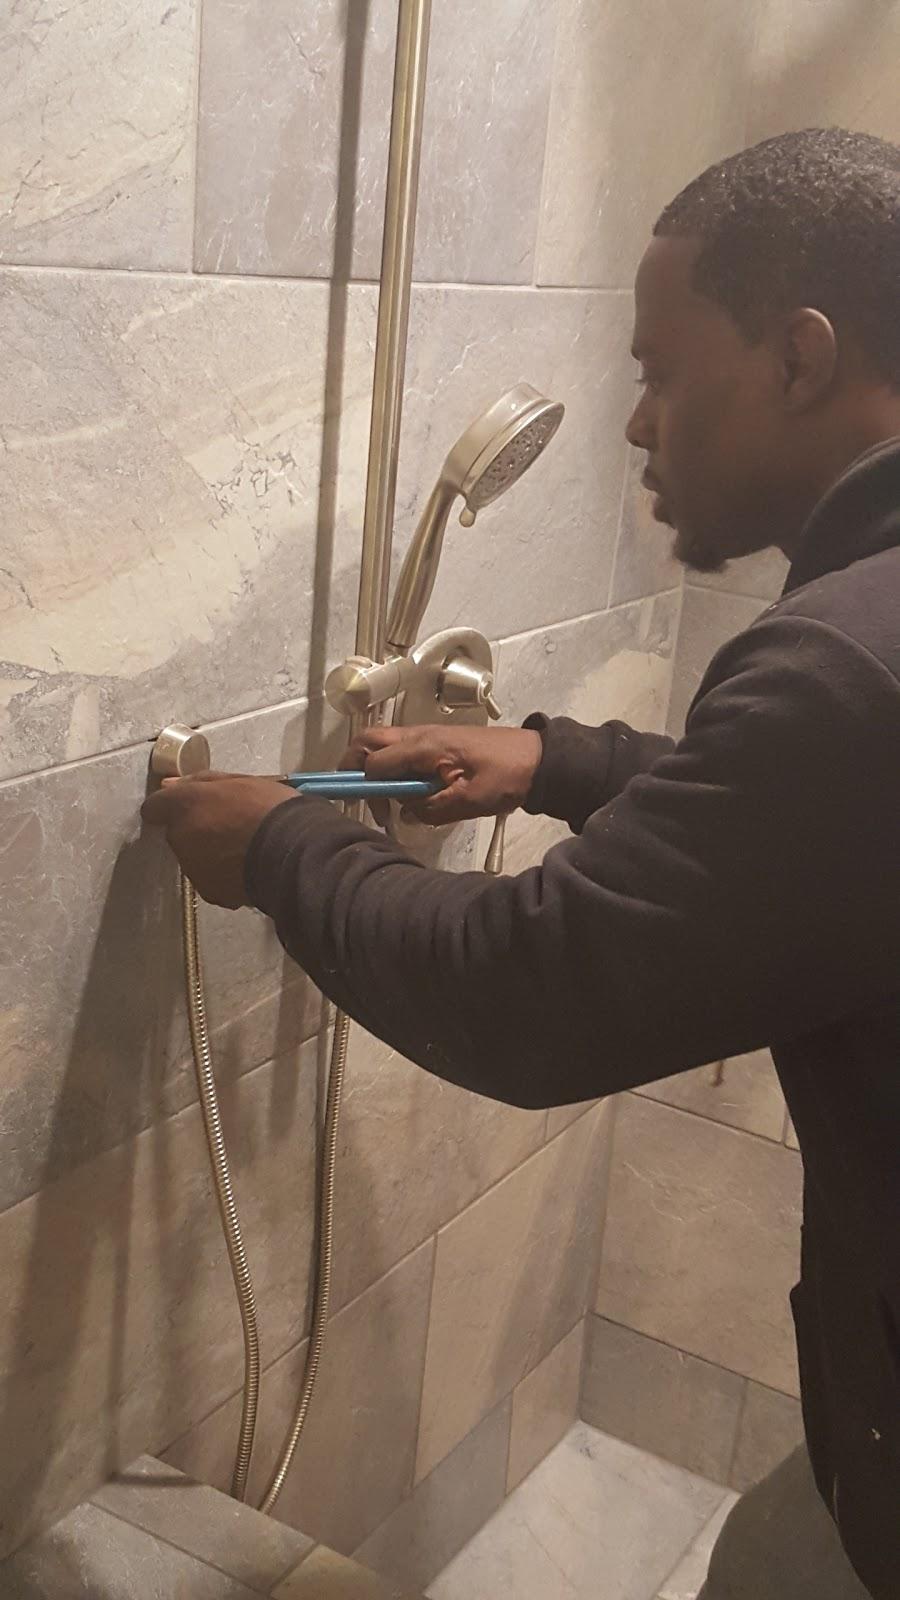 Dons Plumbing Repair And Drain Cleaning - plumber    Photo 7 of 10   Address: 1872 Saville Garden Ct, Virginia Beach, VA 23453, USA   Phone: (757) 309-0001